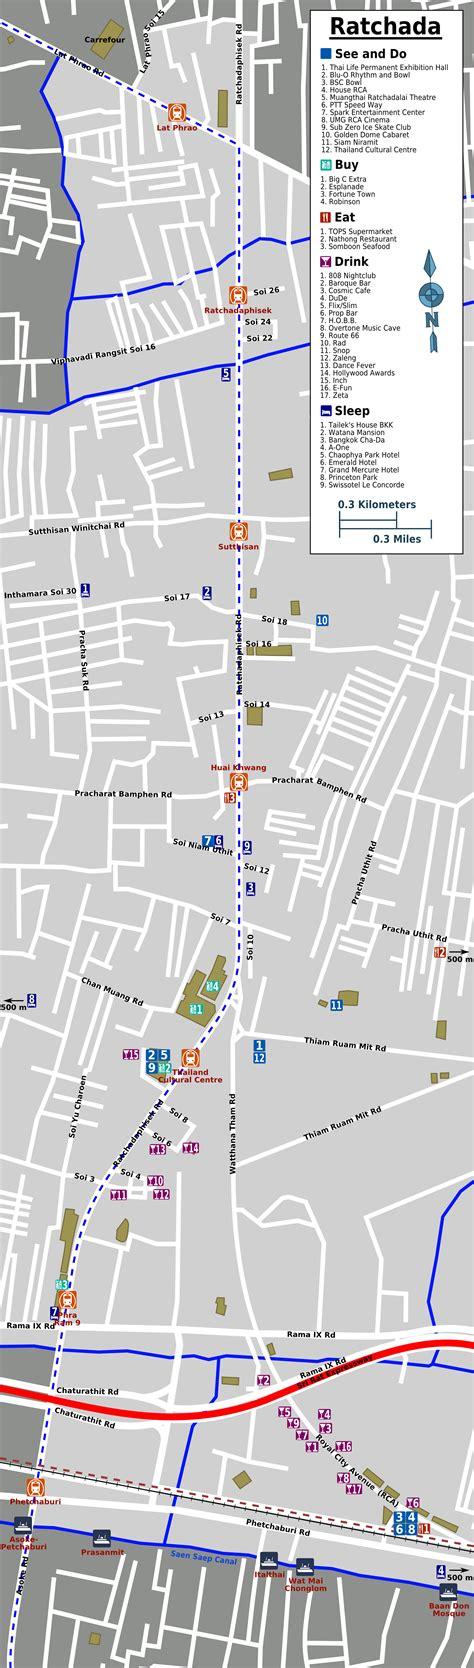 Tiket Siam Niramit Bangkok Cepat Murah Dewasa all about bangkok page 30 kaskus